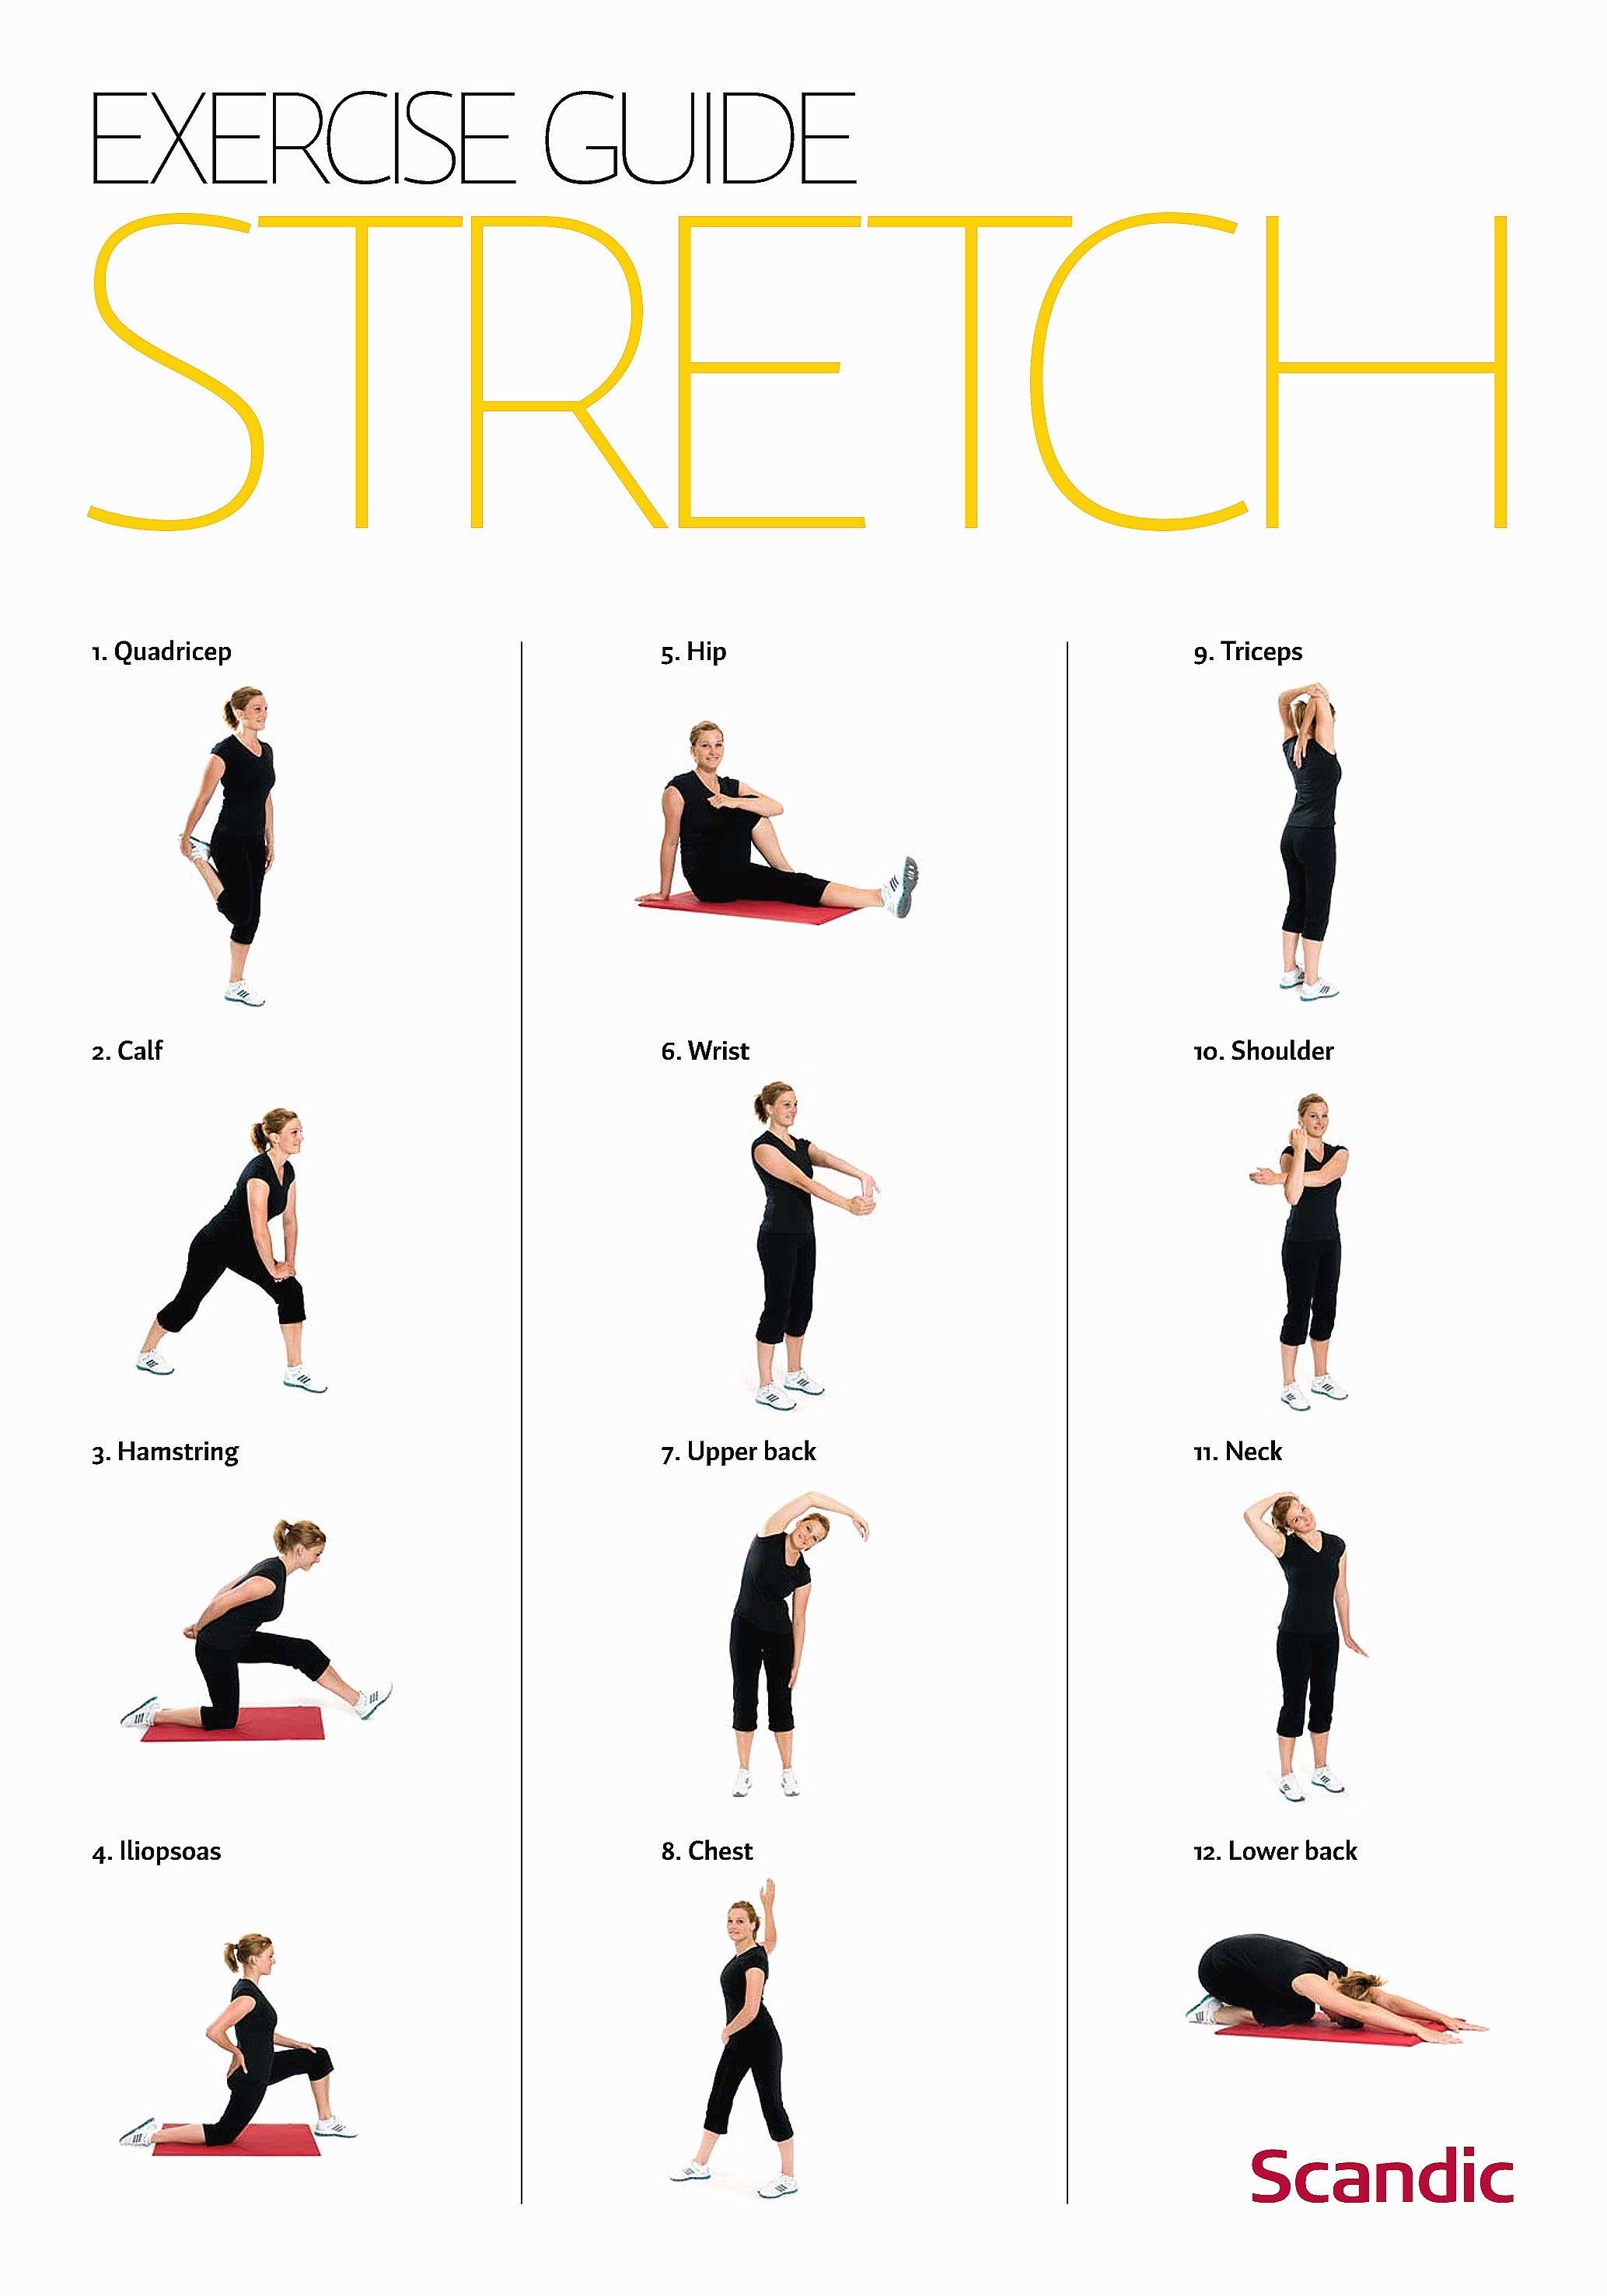 Chair Exercises For Seniors Pdf Lovely Therabanda Upper Body Exercises Back Shoulders Arms T Upper Body Workout Exercise Upper Back Strengthening Exercises